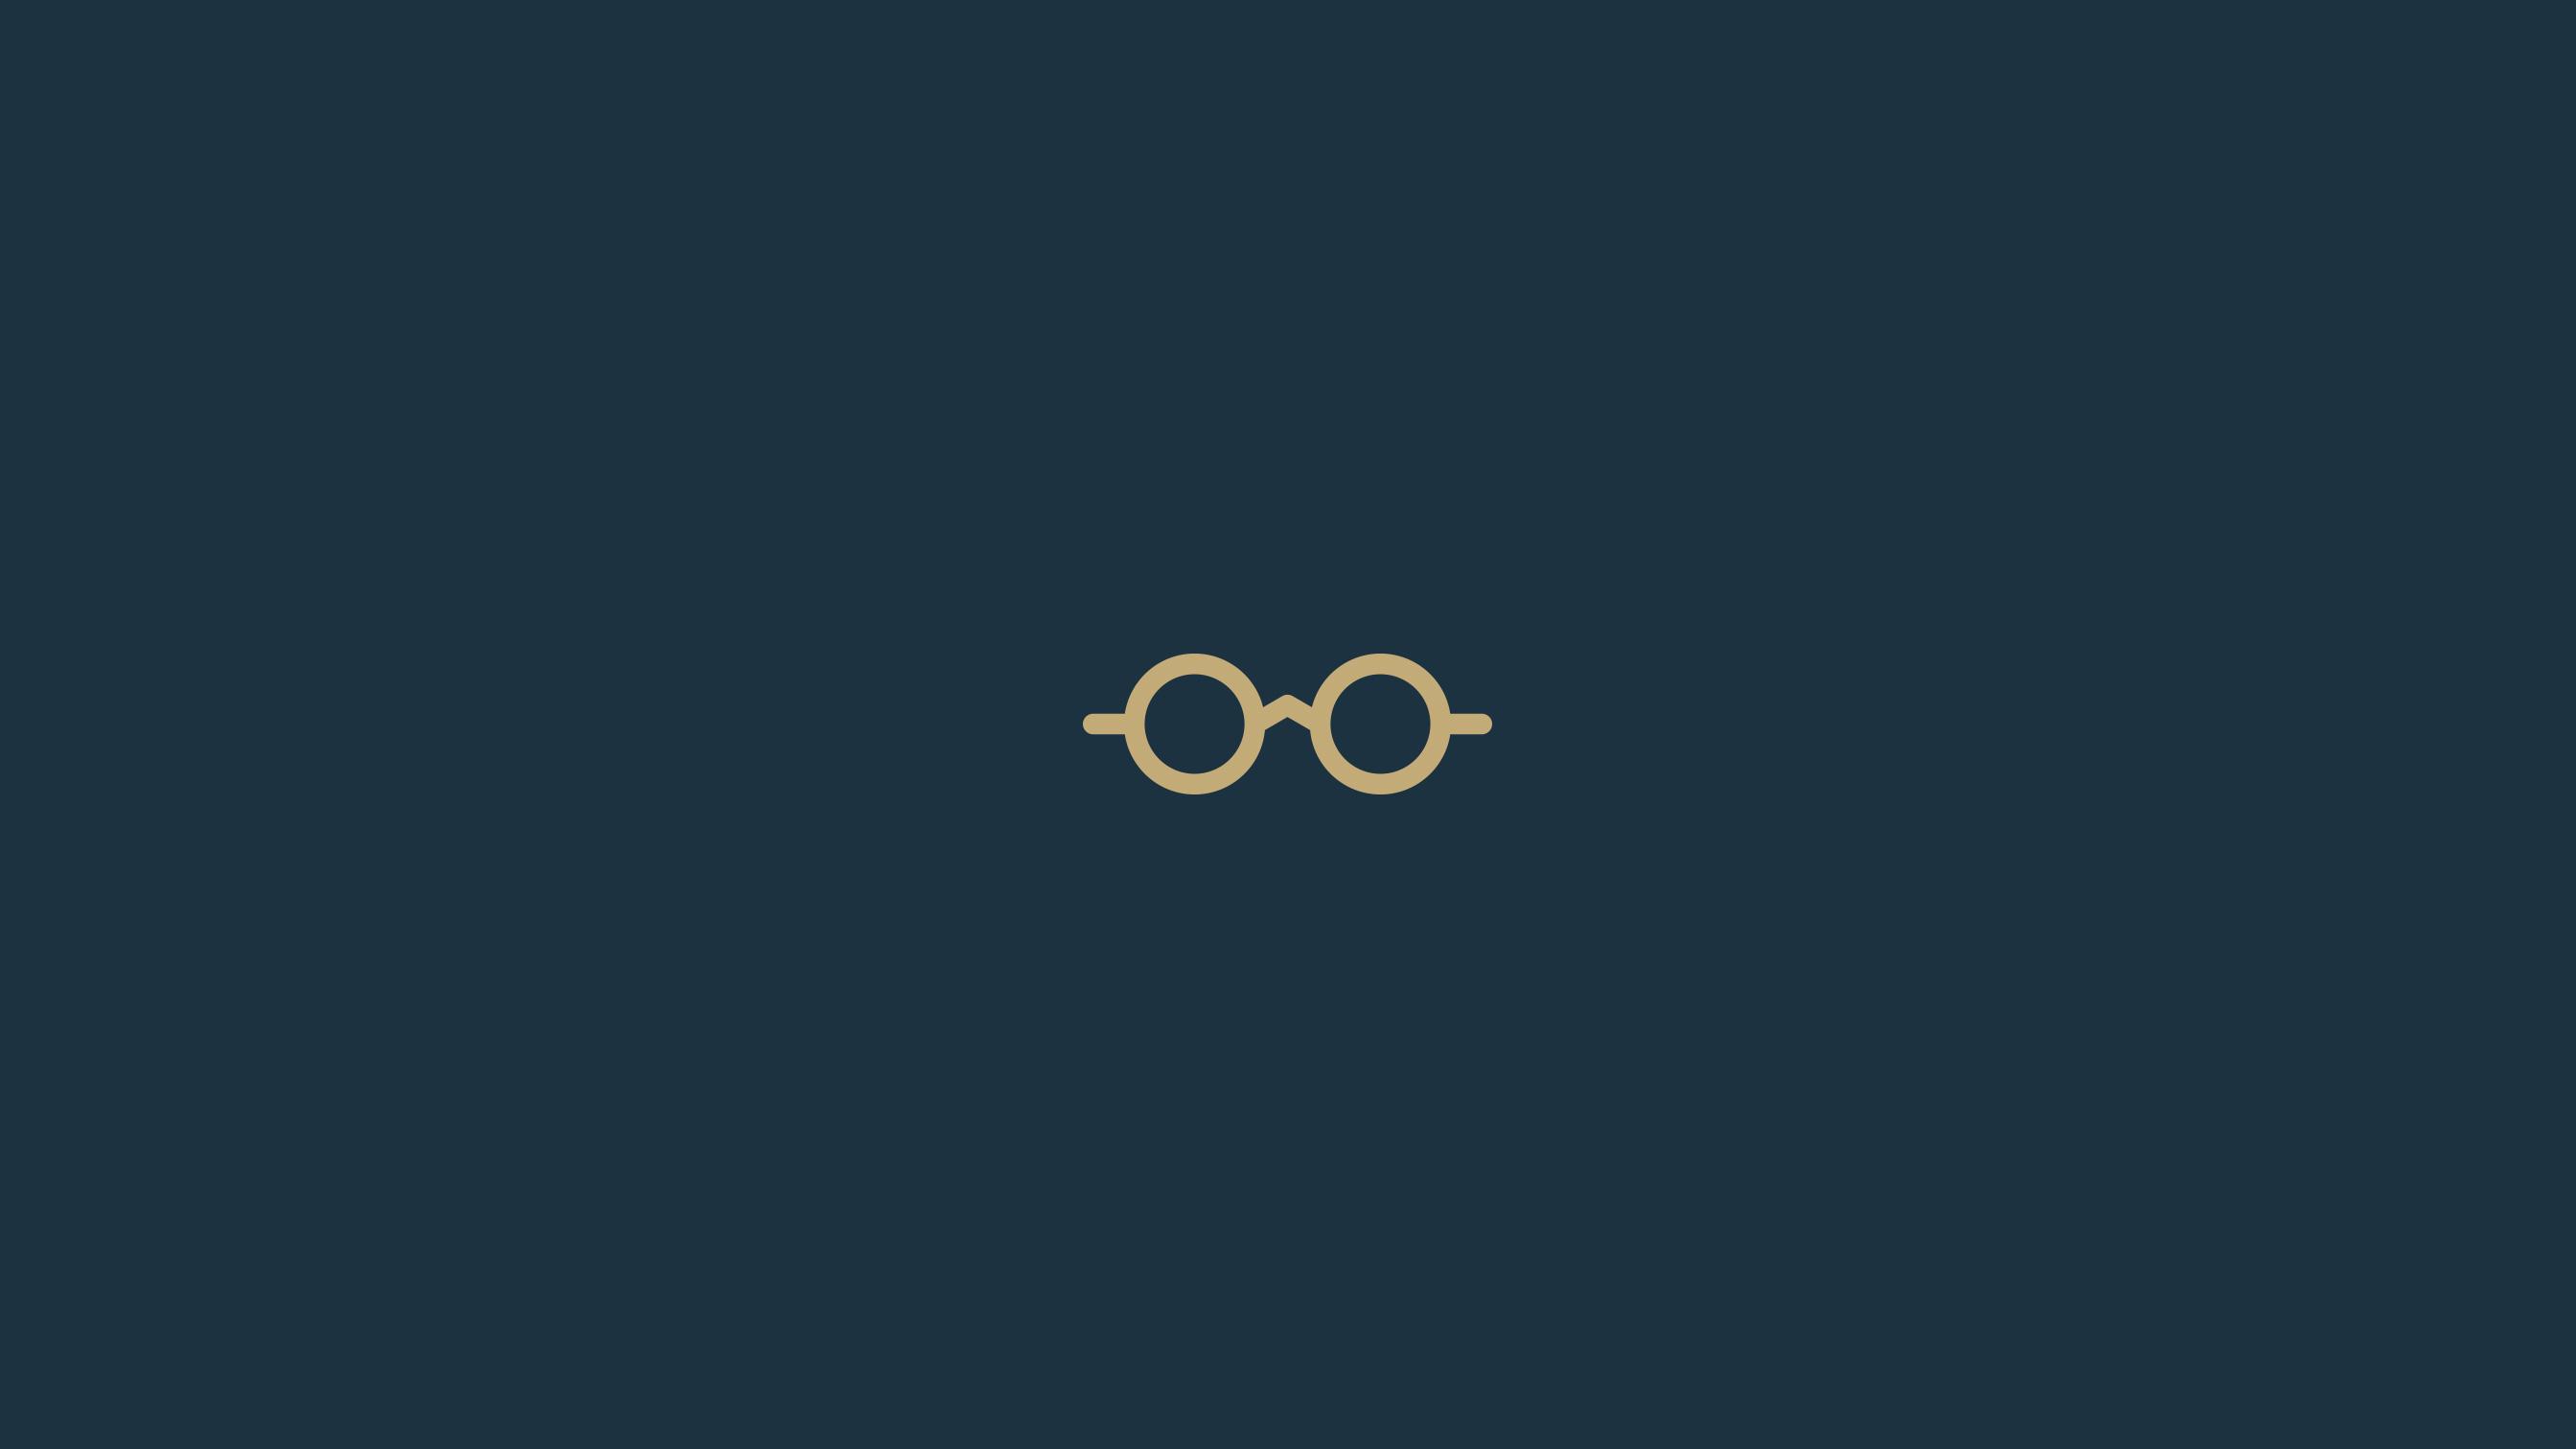 02-laurent-frot-opticien-pikteo-webdesign-graphic-design-freelance-paris-bruxelles-londres